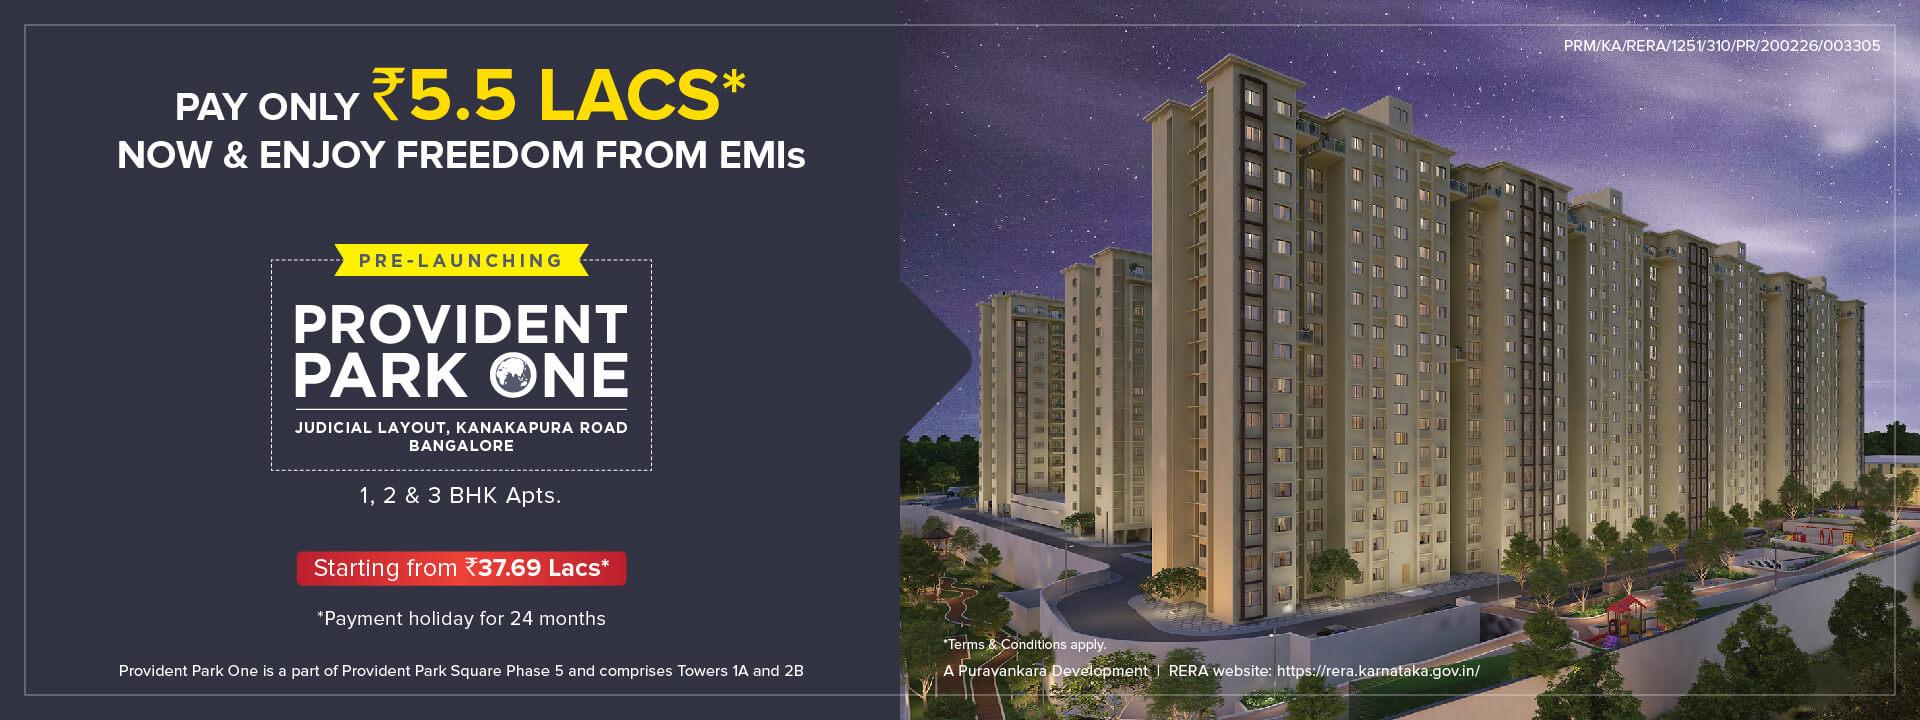 Provident Park One | Apartments for sale in Kanakapura Road, Bangalore